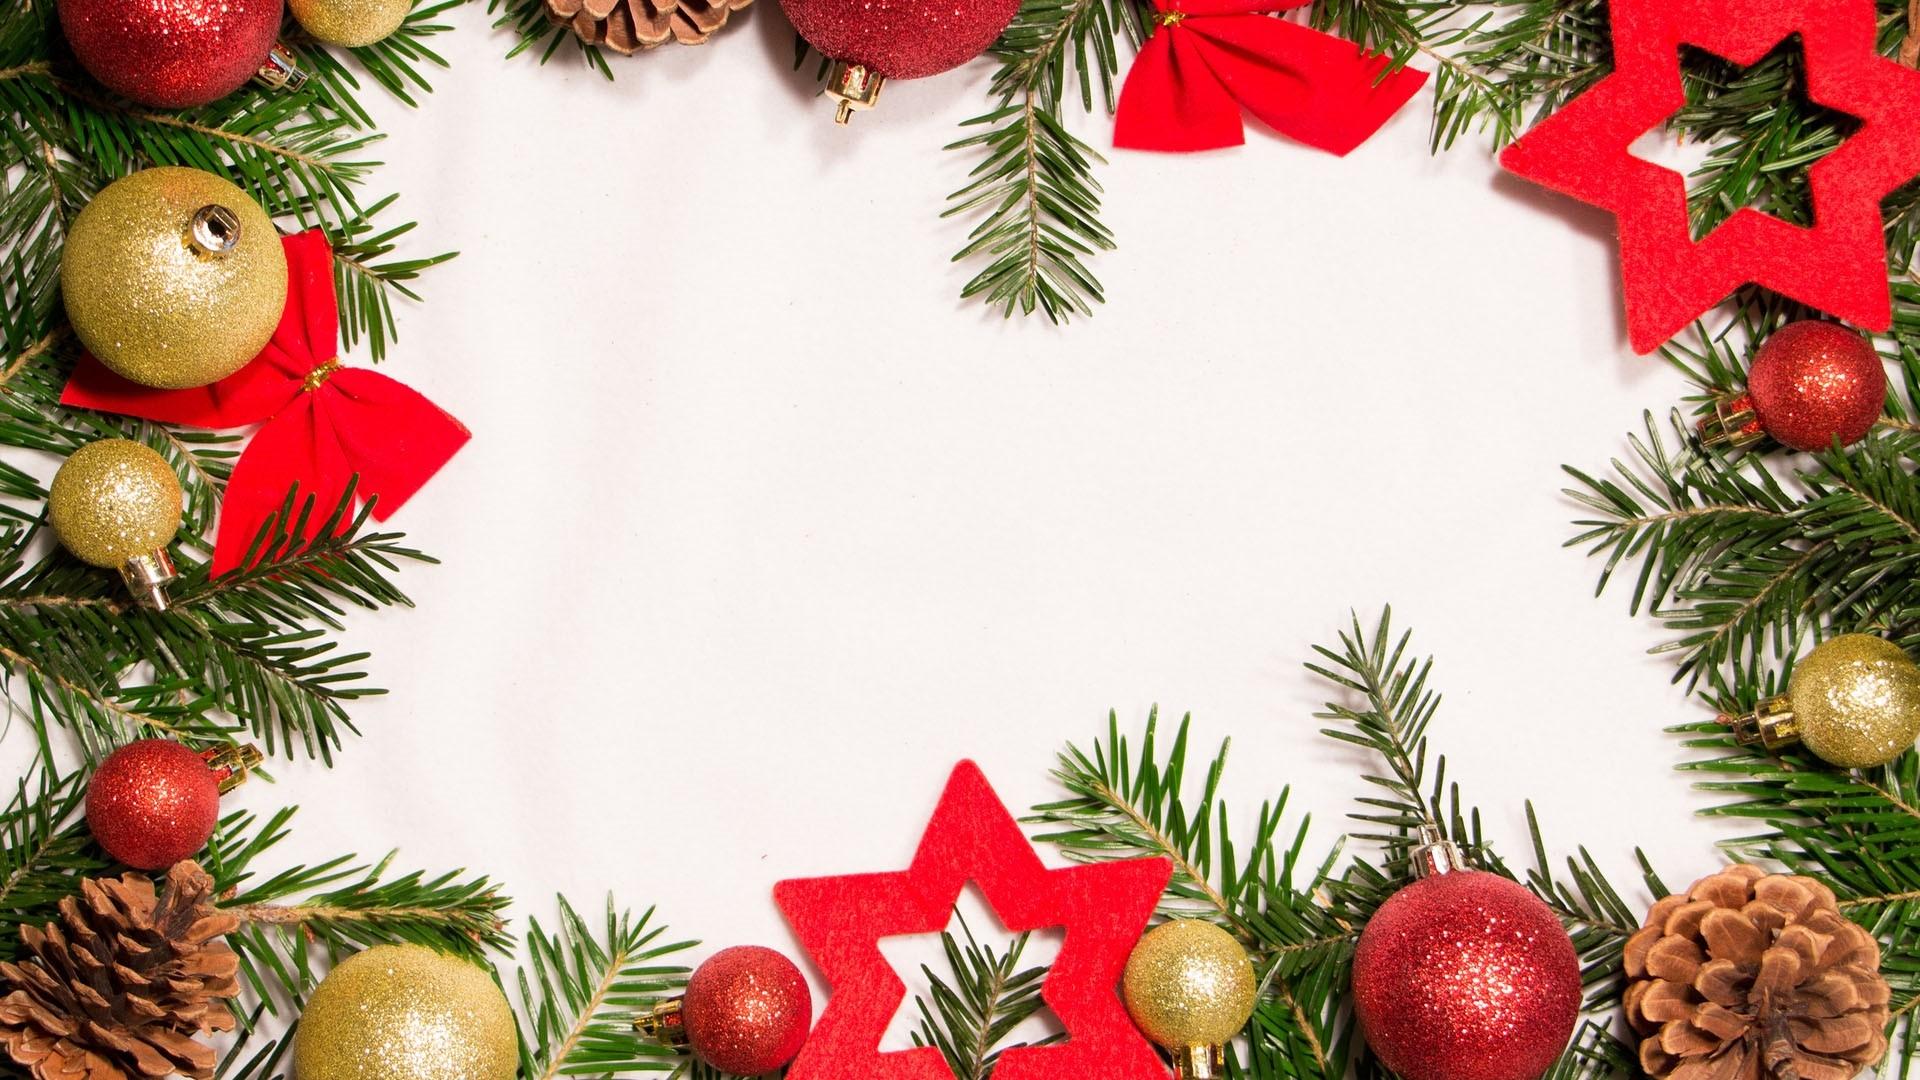 New Year Branch Frame Wallpaper theme